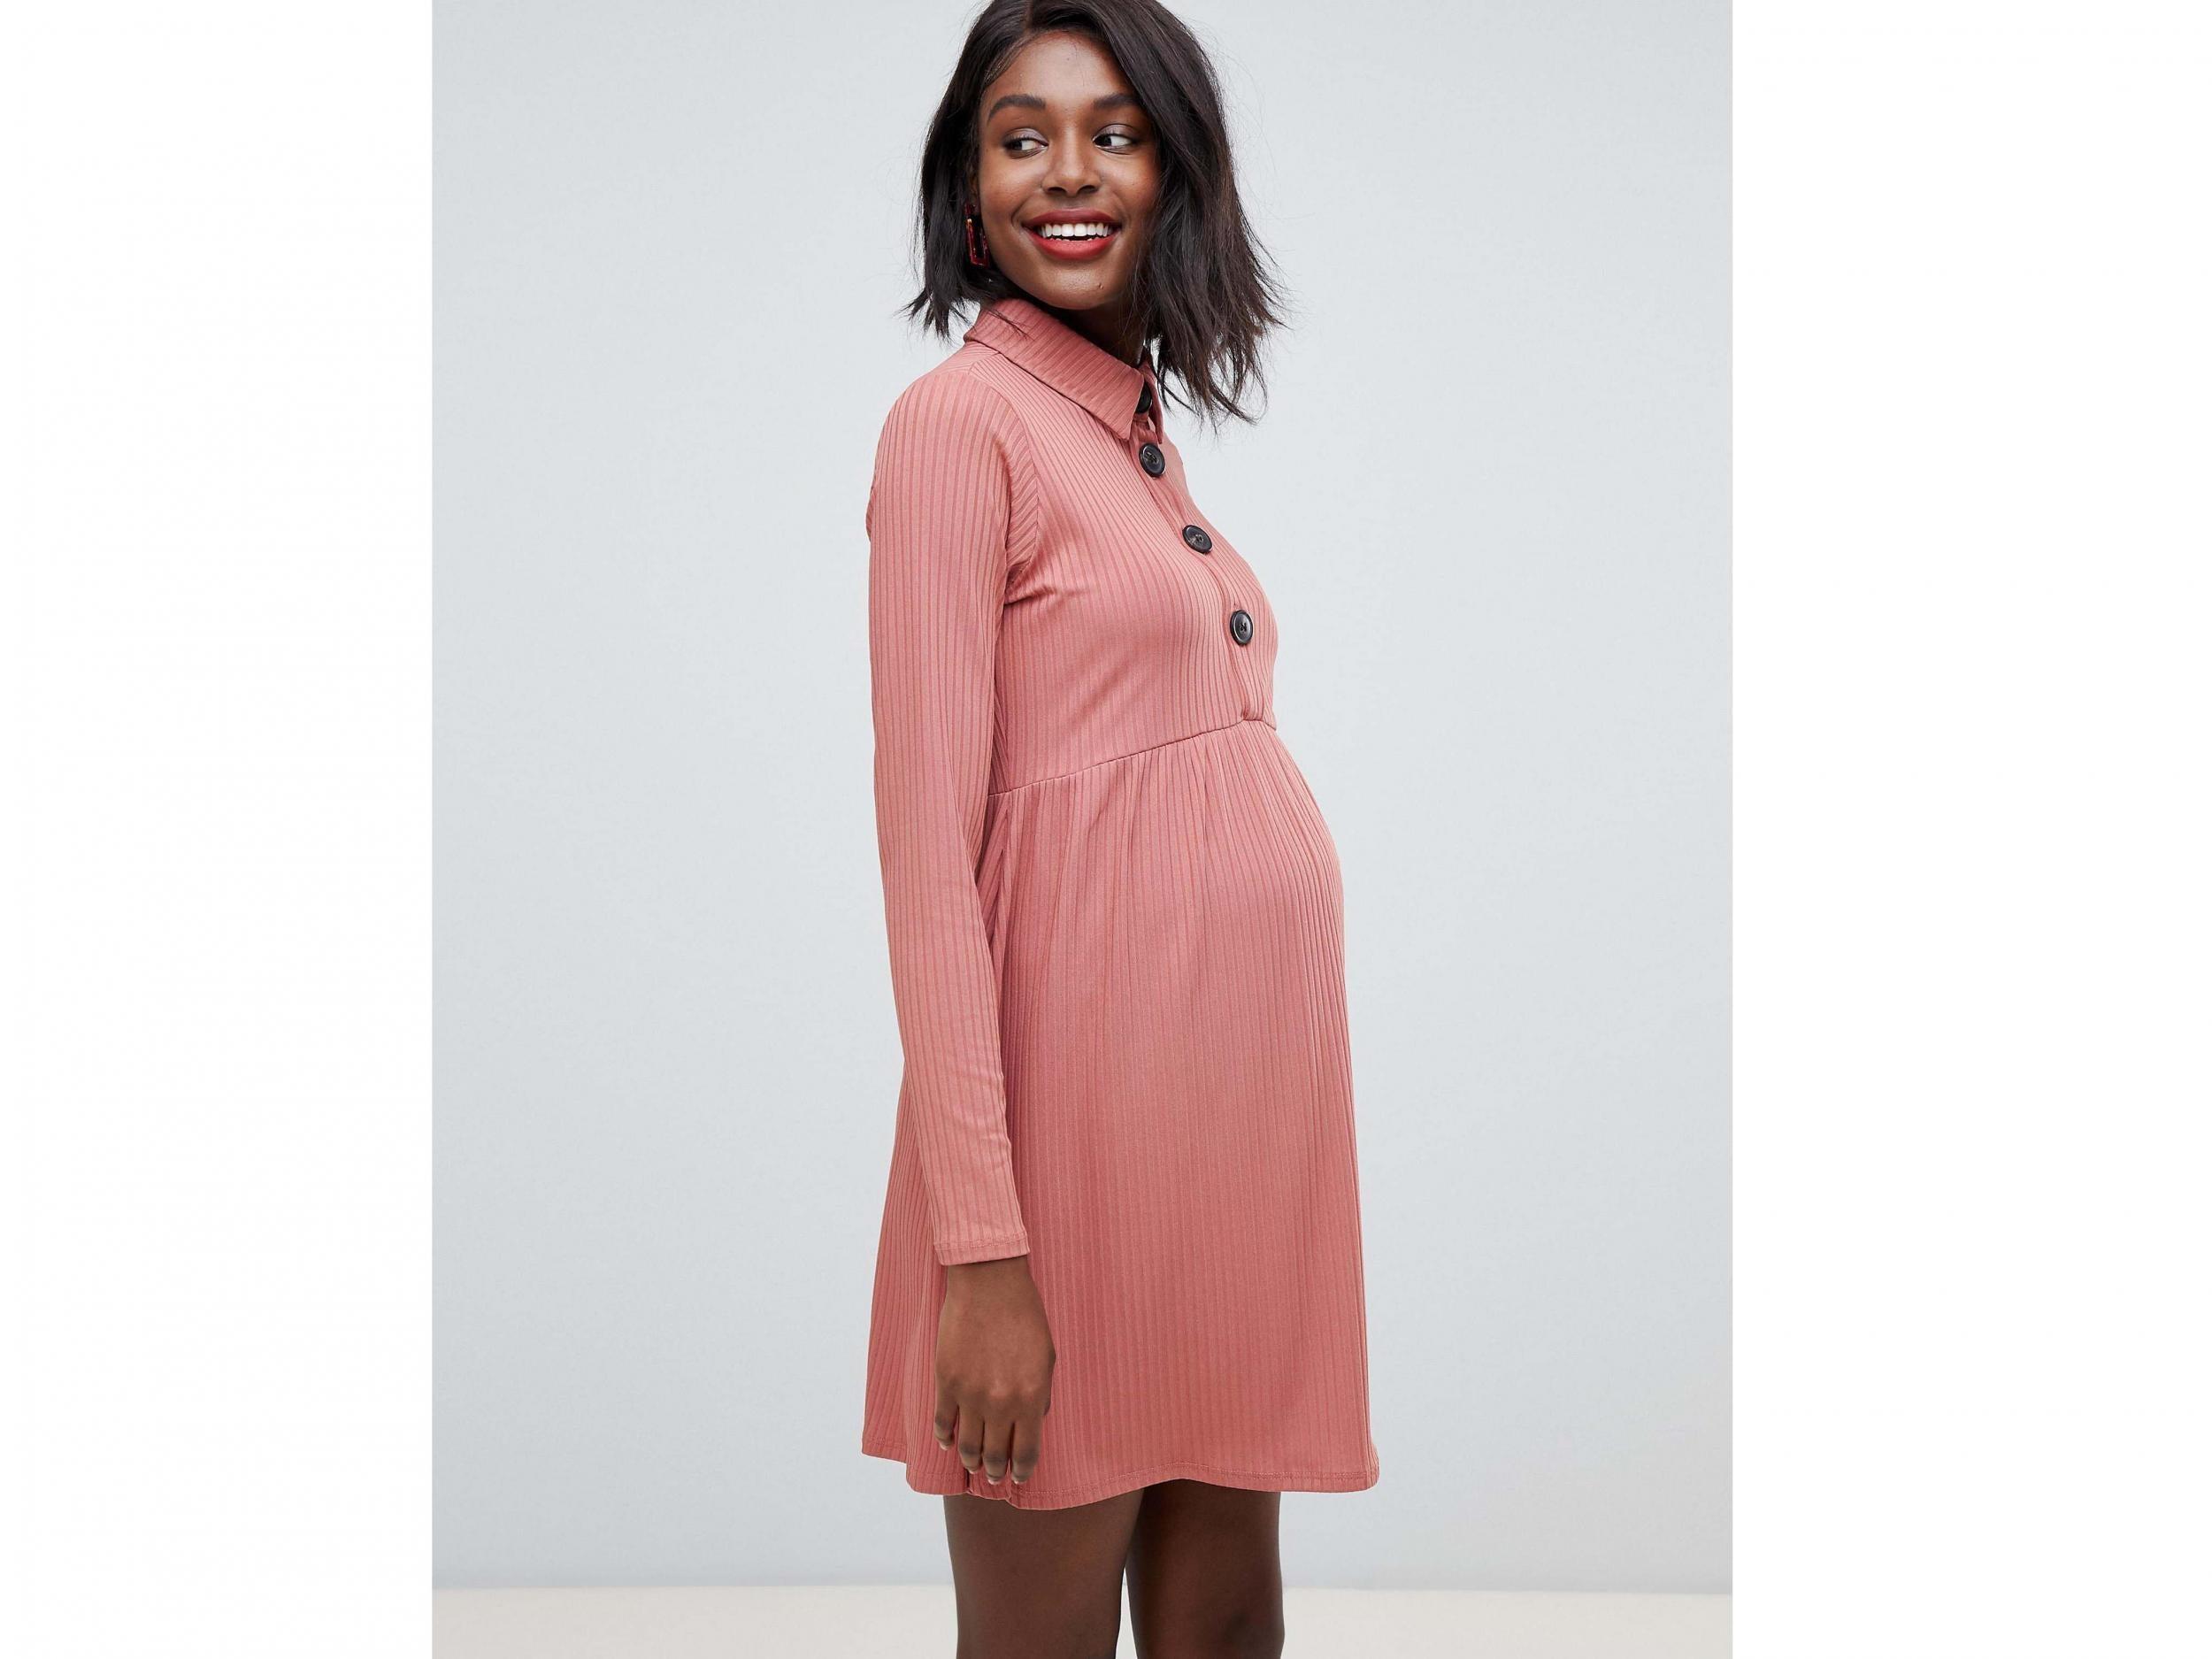 ASOS Maternity Dresses